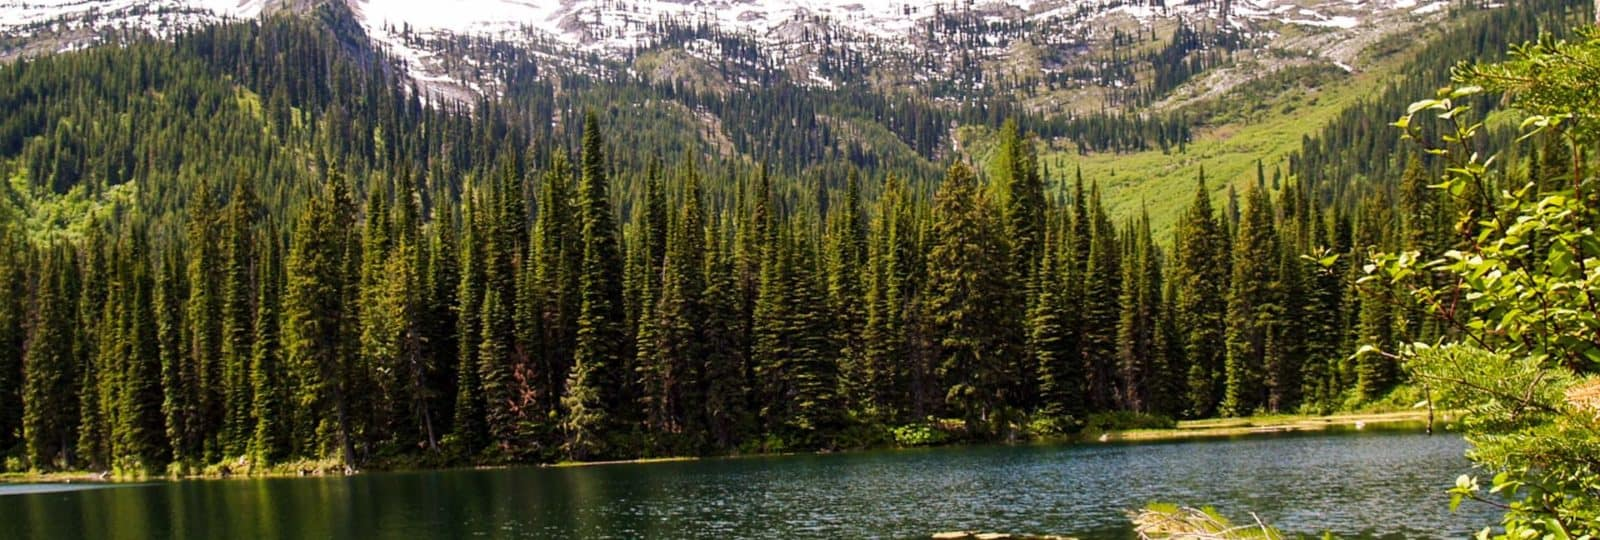 Kanadas Schatzkästchen Alberta